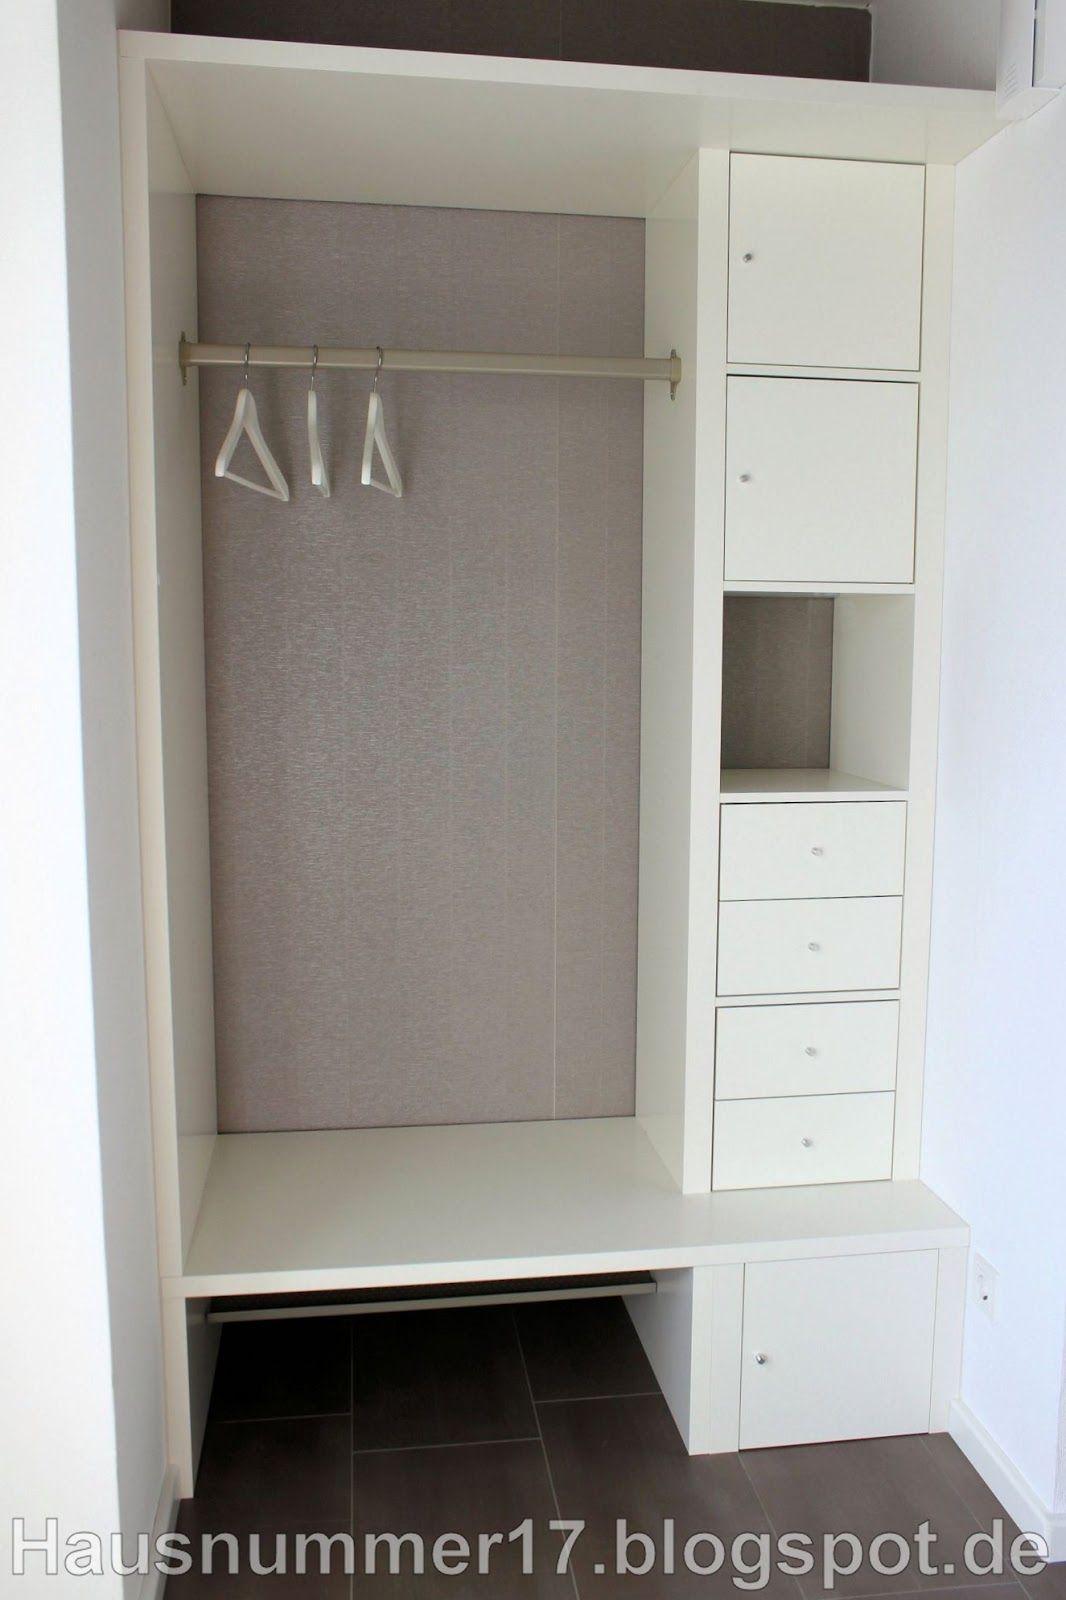 Ikea Hack Eine Flur Garderobe Selber Bauen Garderobe Selber